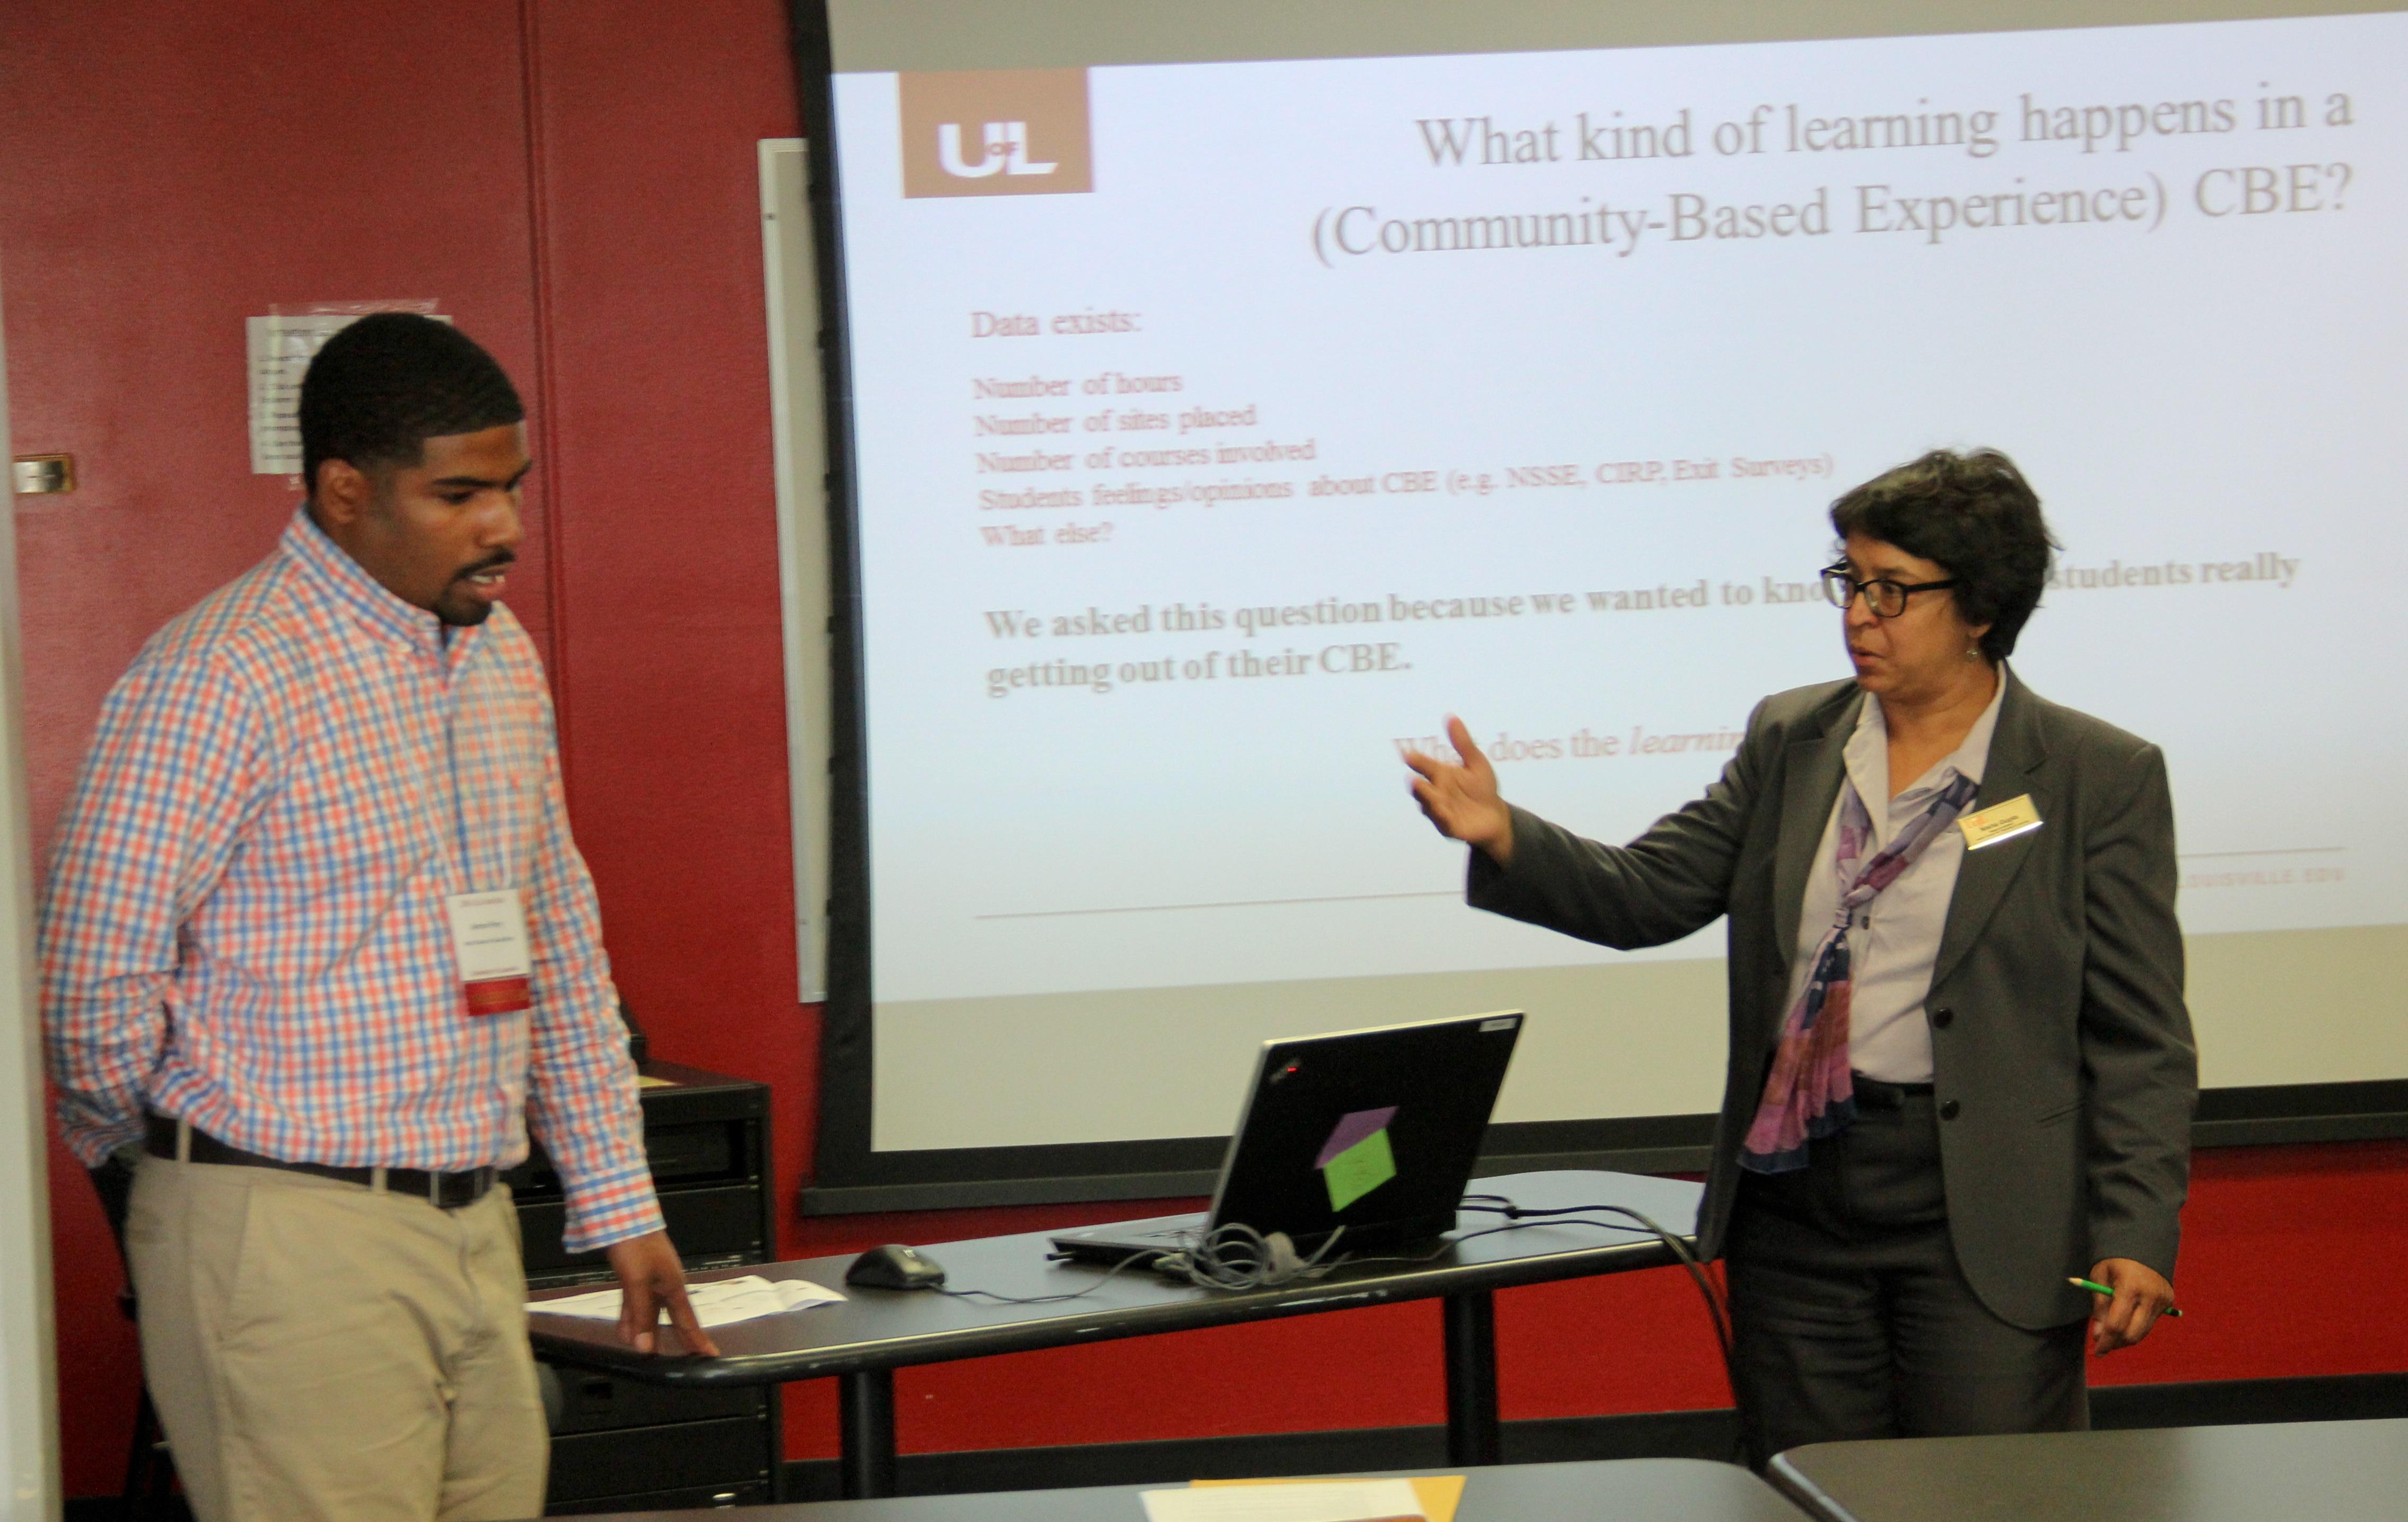 Drs. Armon Perry and Nisha Gupta